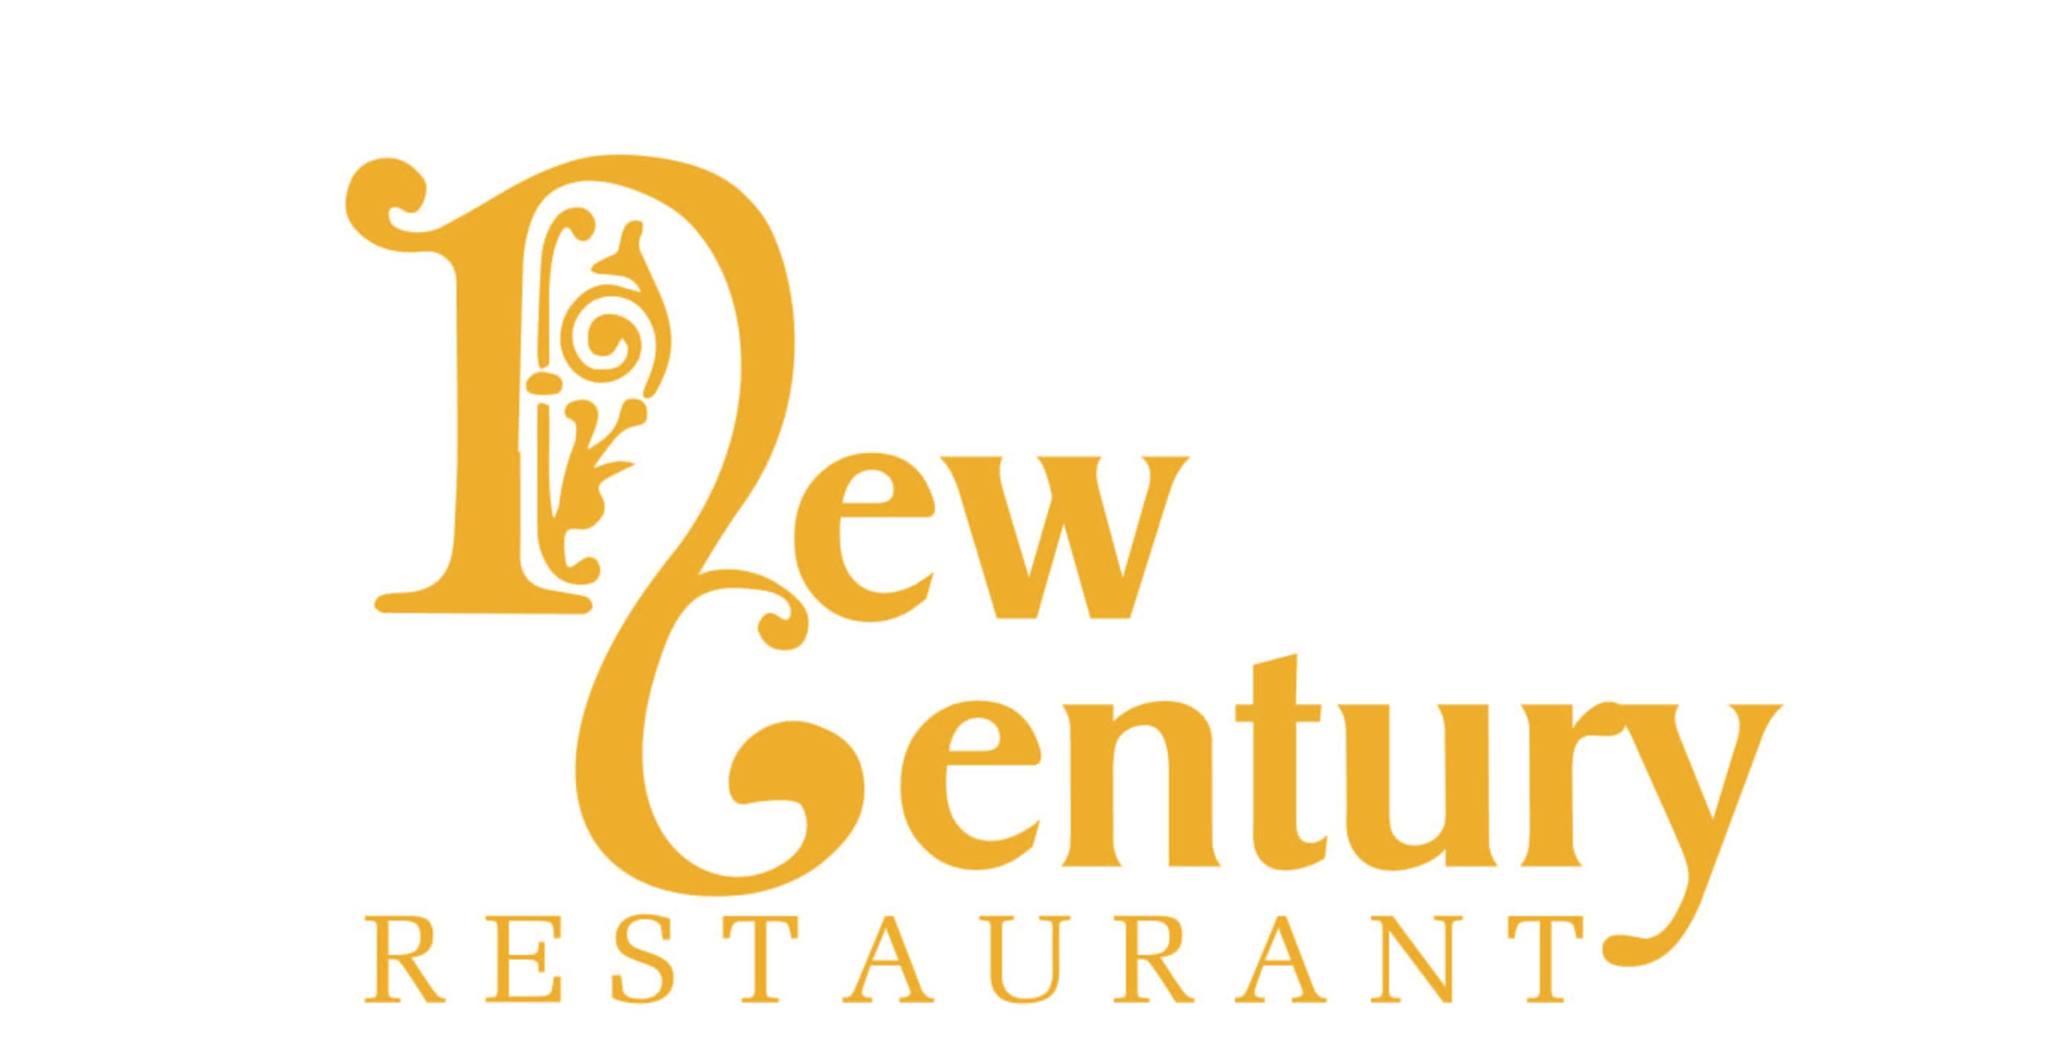 New Century Restaurant logo